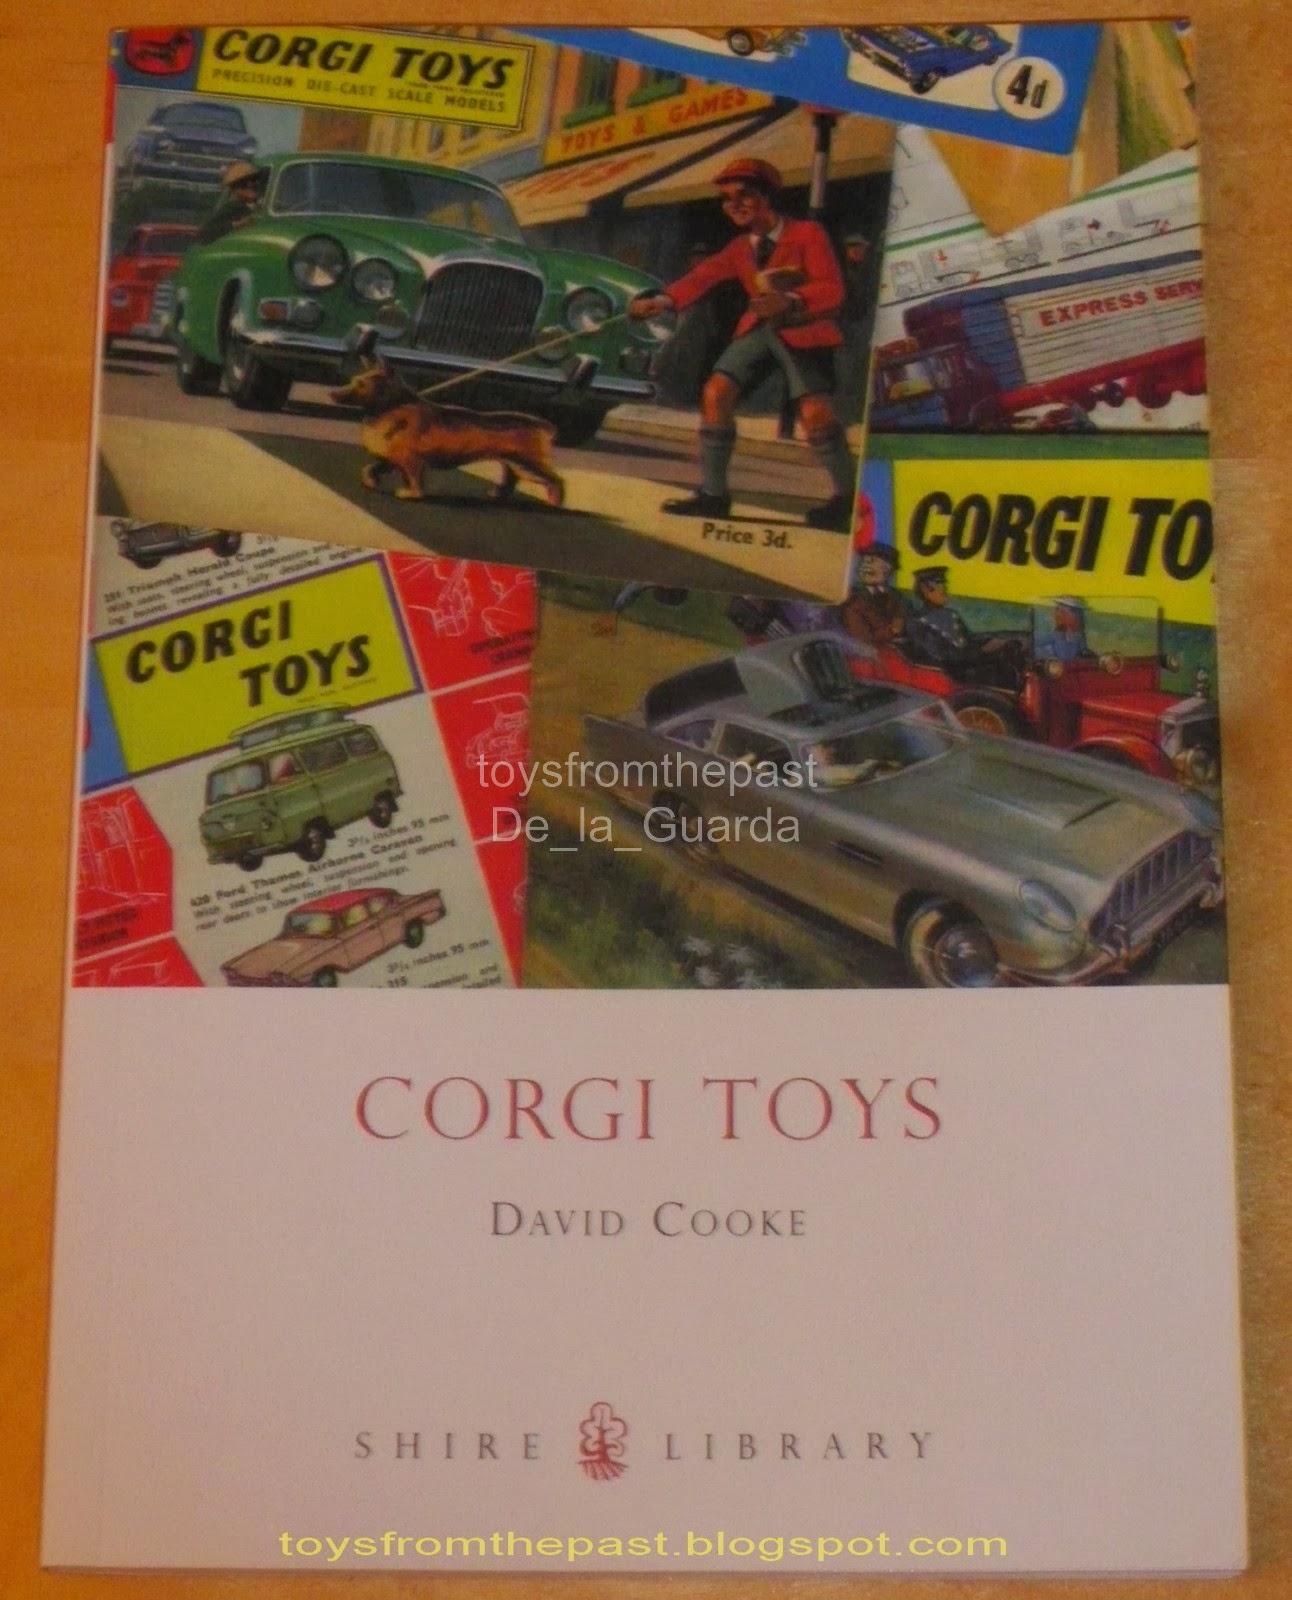 Toys from the Past: #343 CORGI TOYS (David Cooke)